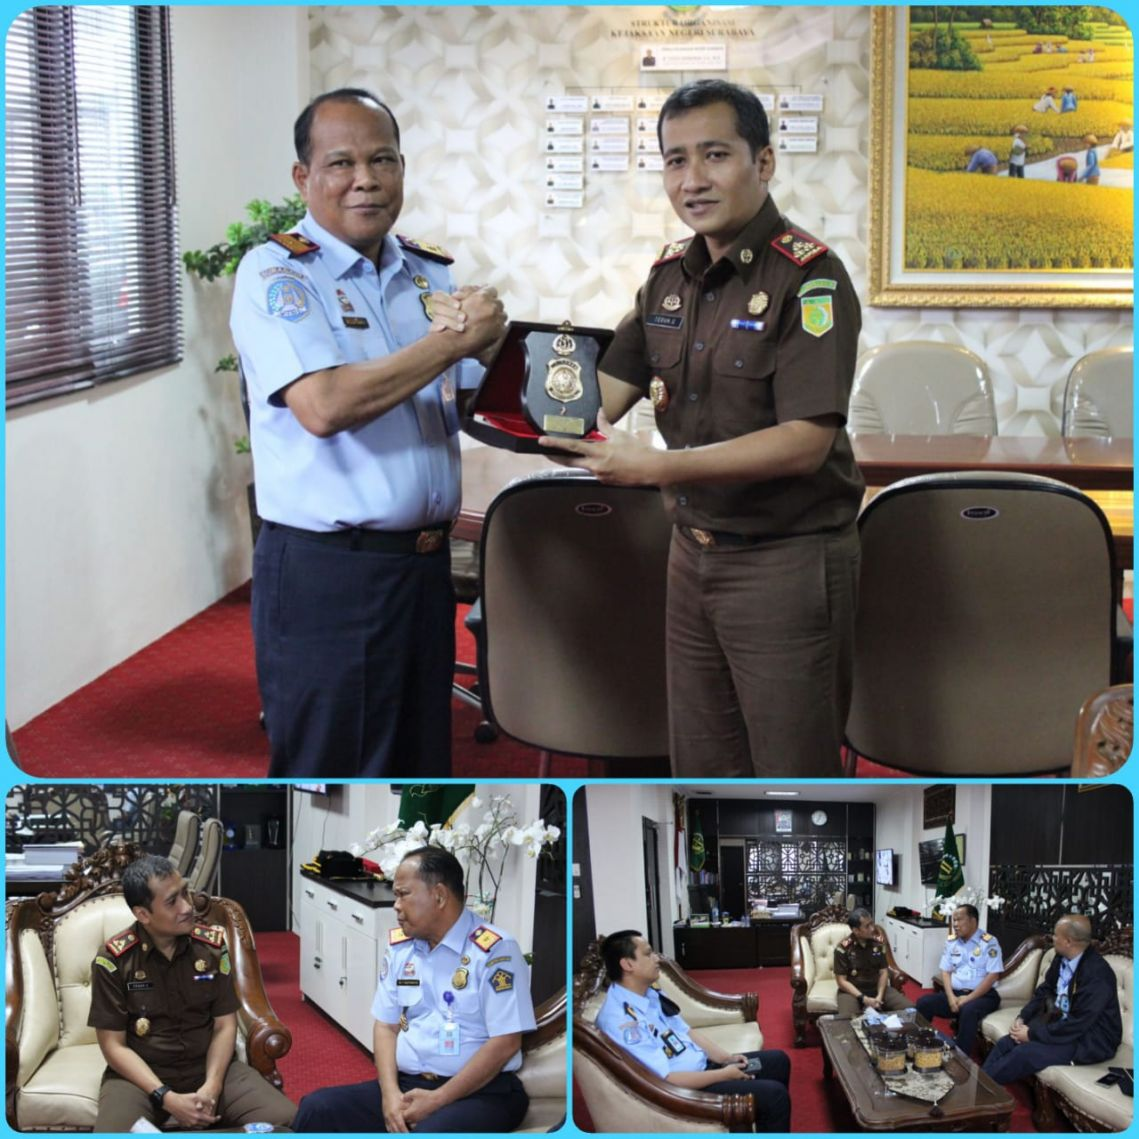 Silaturahmi Kepala Imigrasi Ke Kantor Kejaksaan Negeri Surabaya 02-01-2019